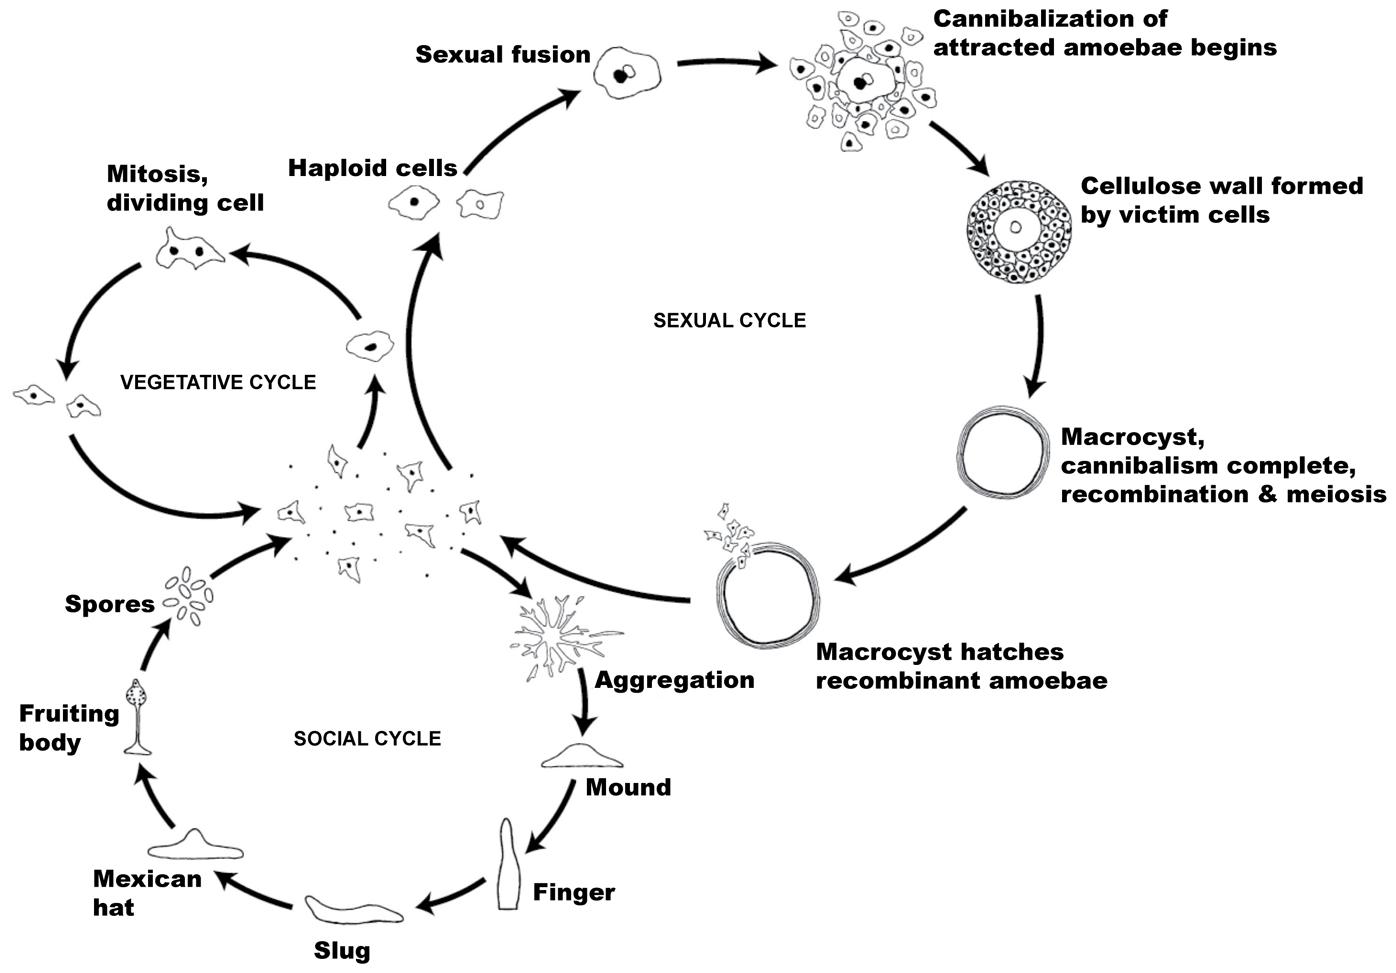 The life cycle of <i>Dictyostelium discoideum</i>.